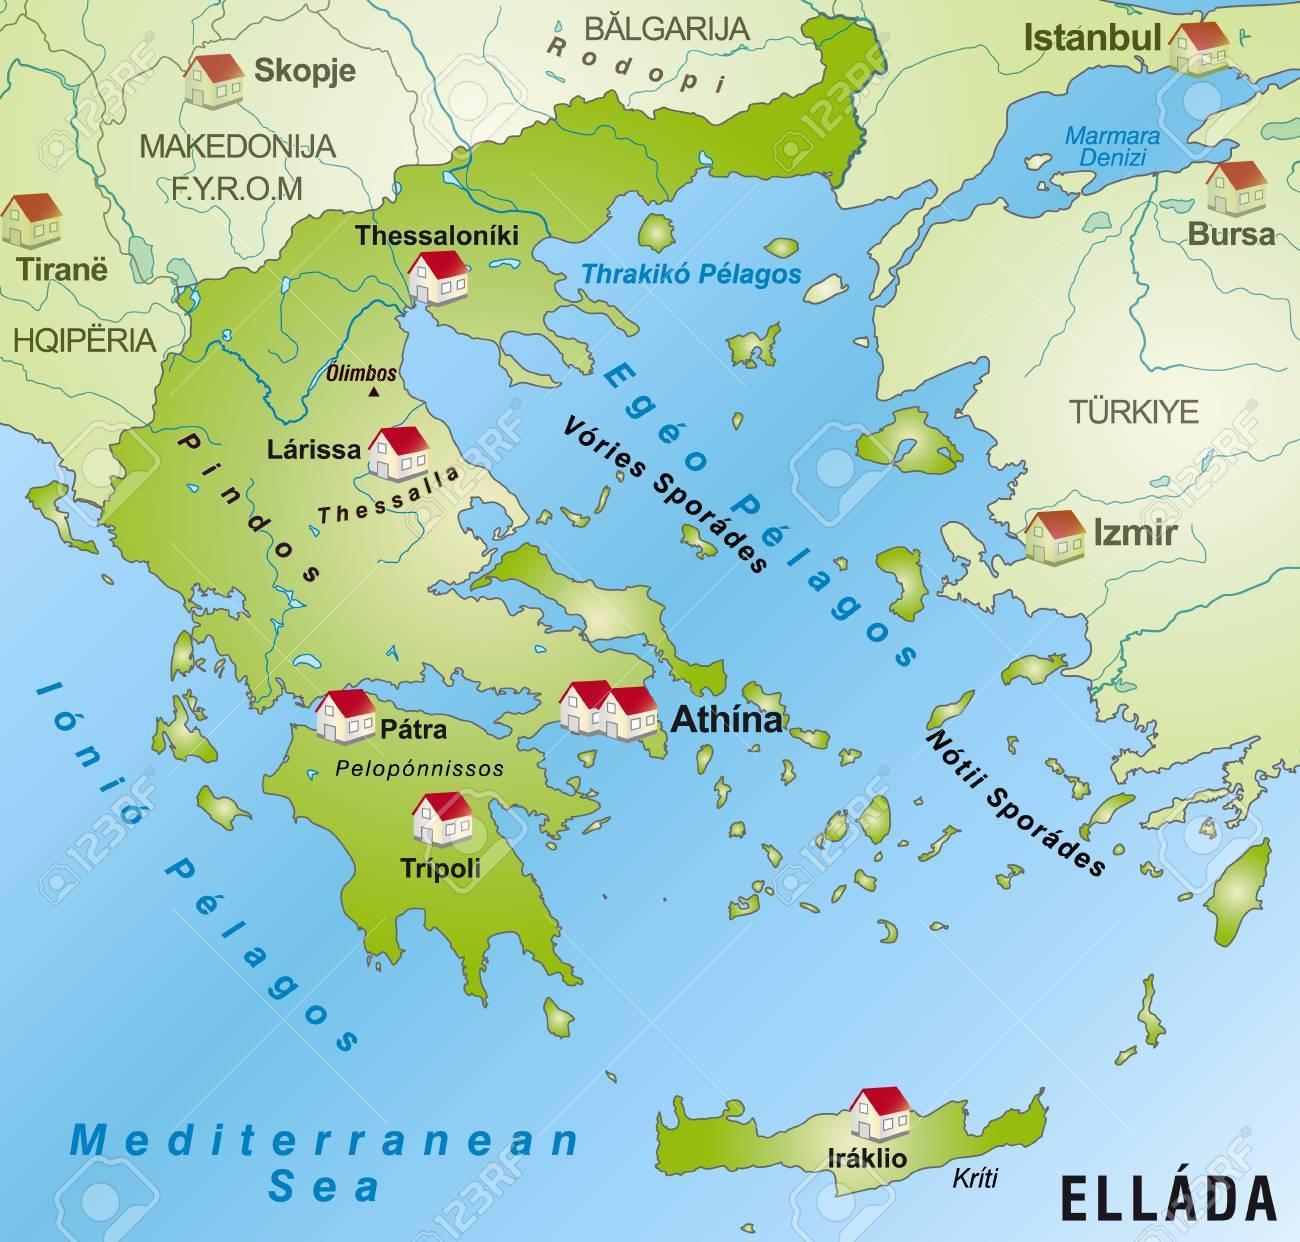 Karte Griechenland.Stock Photo